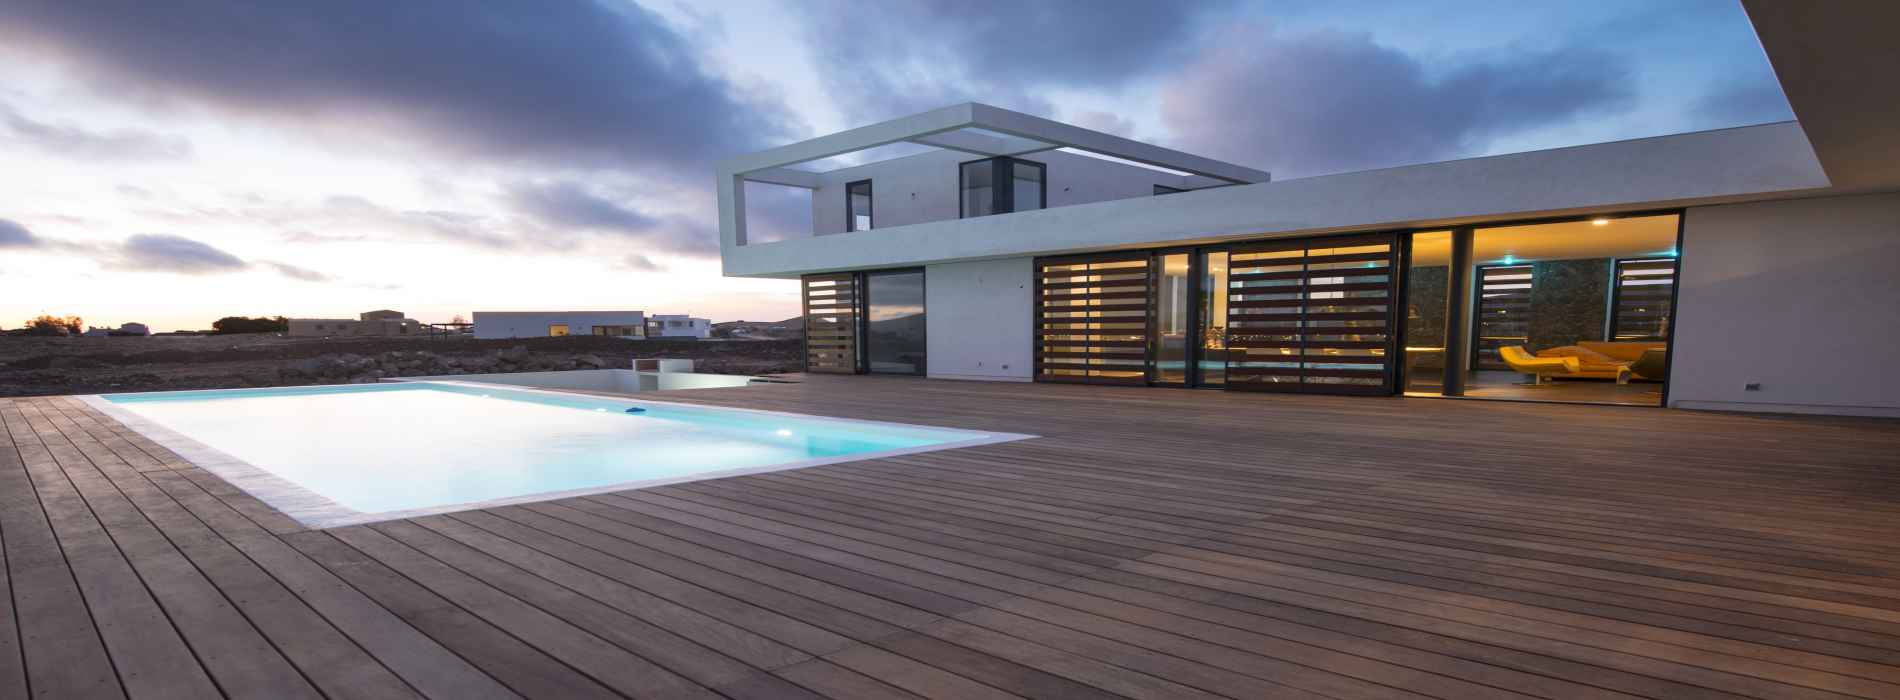 Agence gardon agence immobili re pour l 39 achat la vente for Agence immobiliere location vente